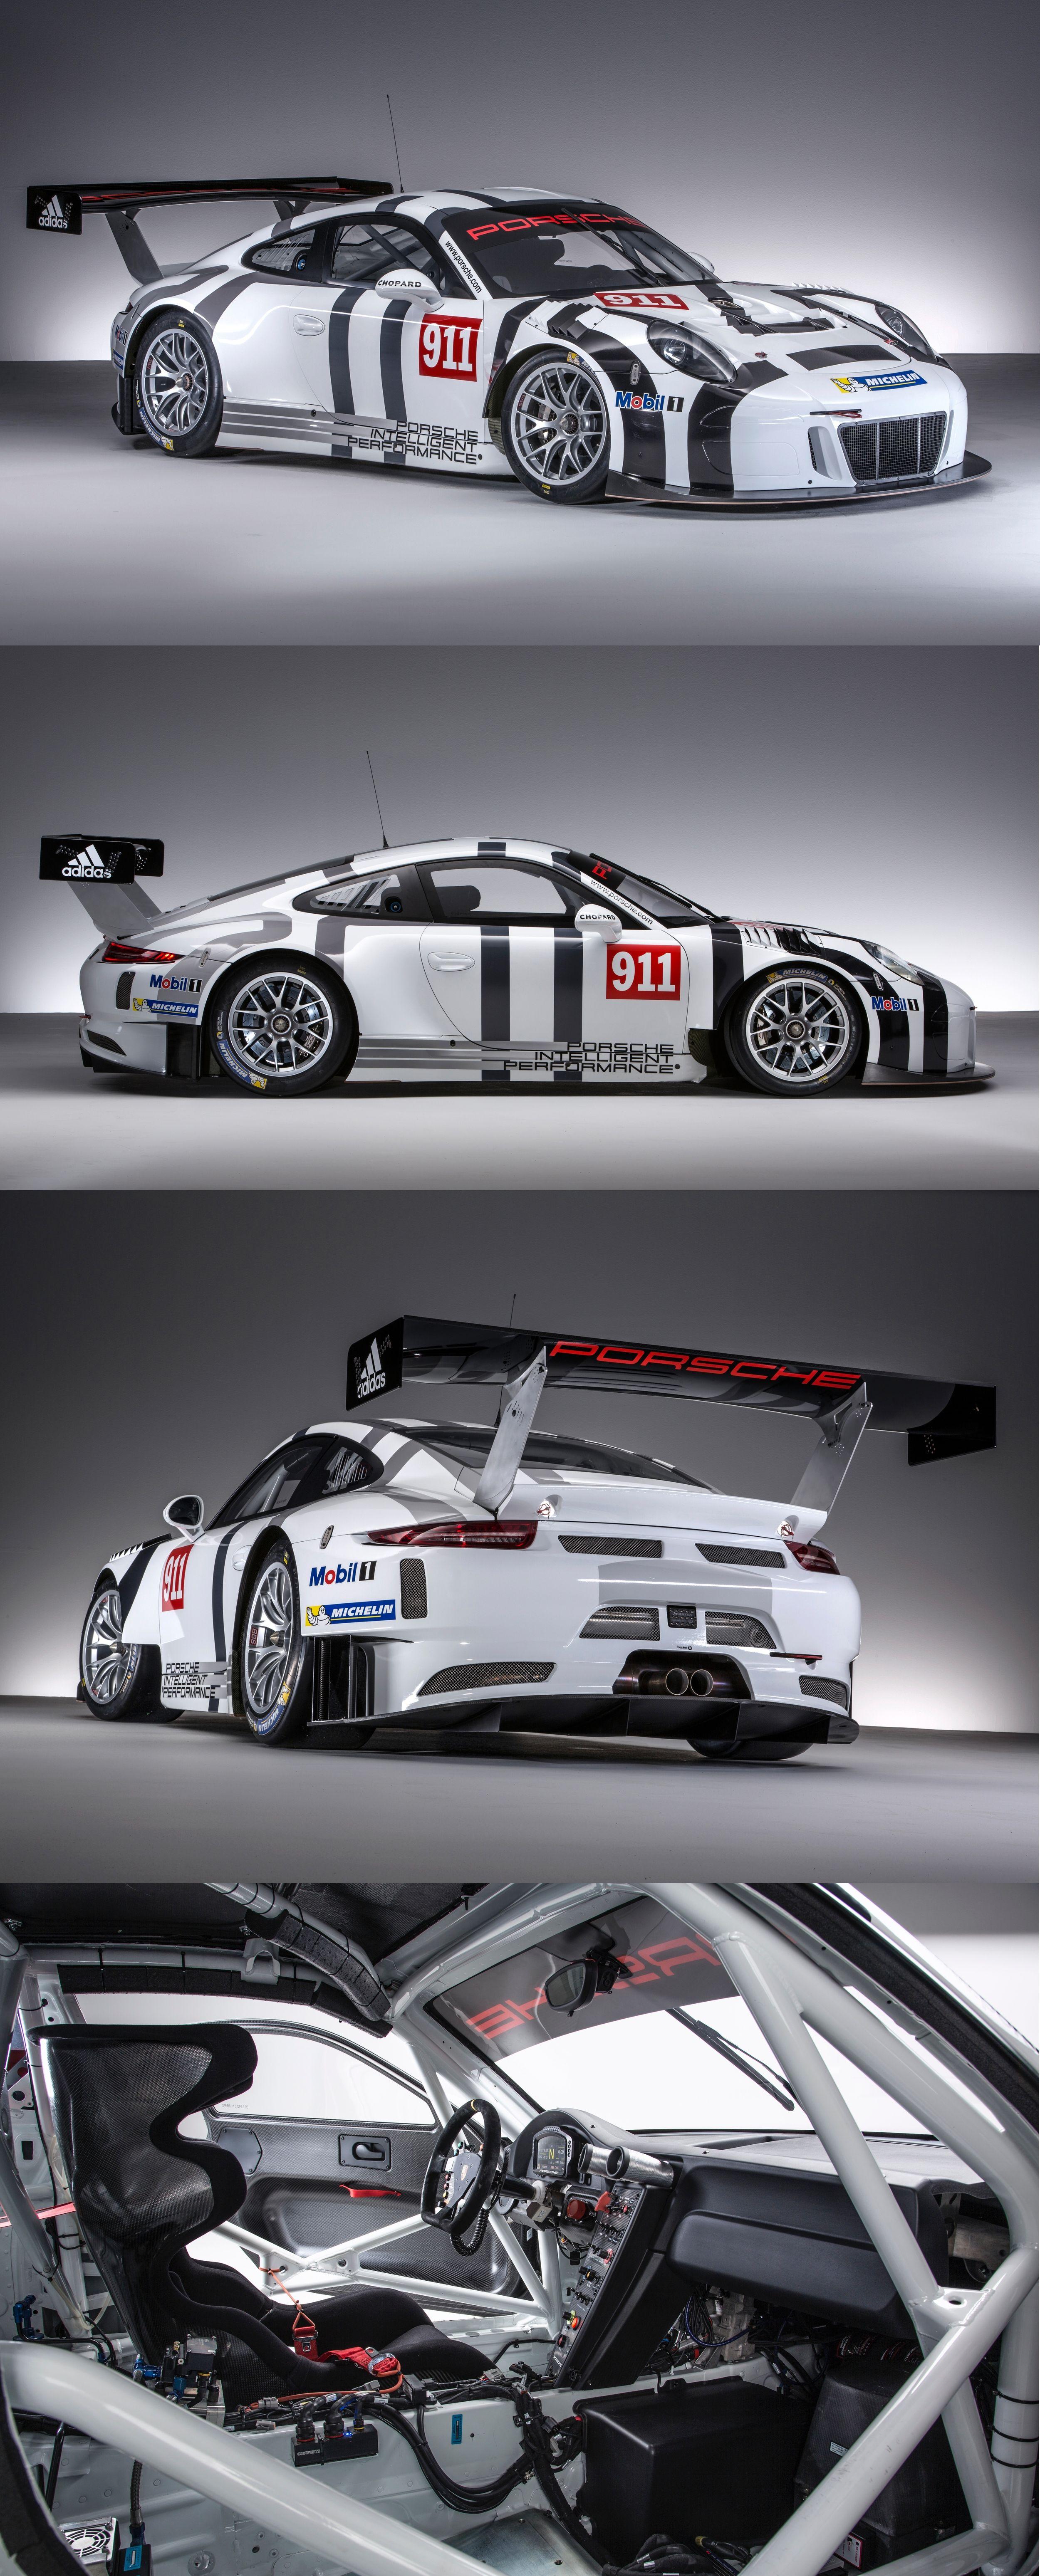 1f5cb62c85cb257334ab8b686f21fd74 Fascinating Porsche 911 Gt1 Evo 98 Slot It Cars Trend